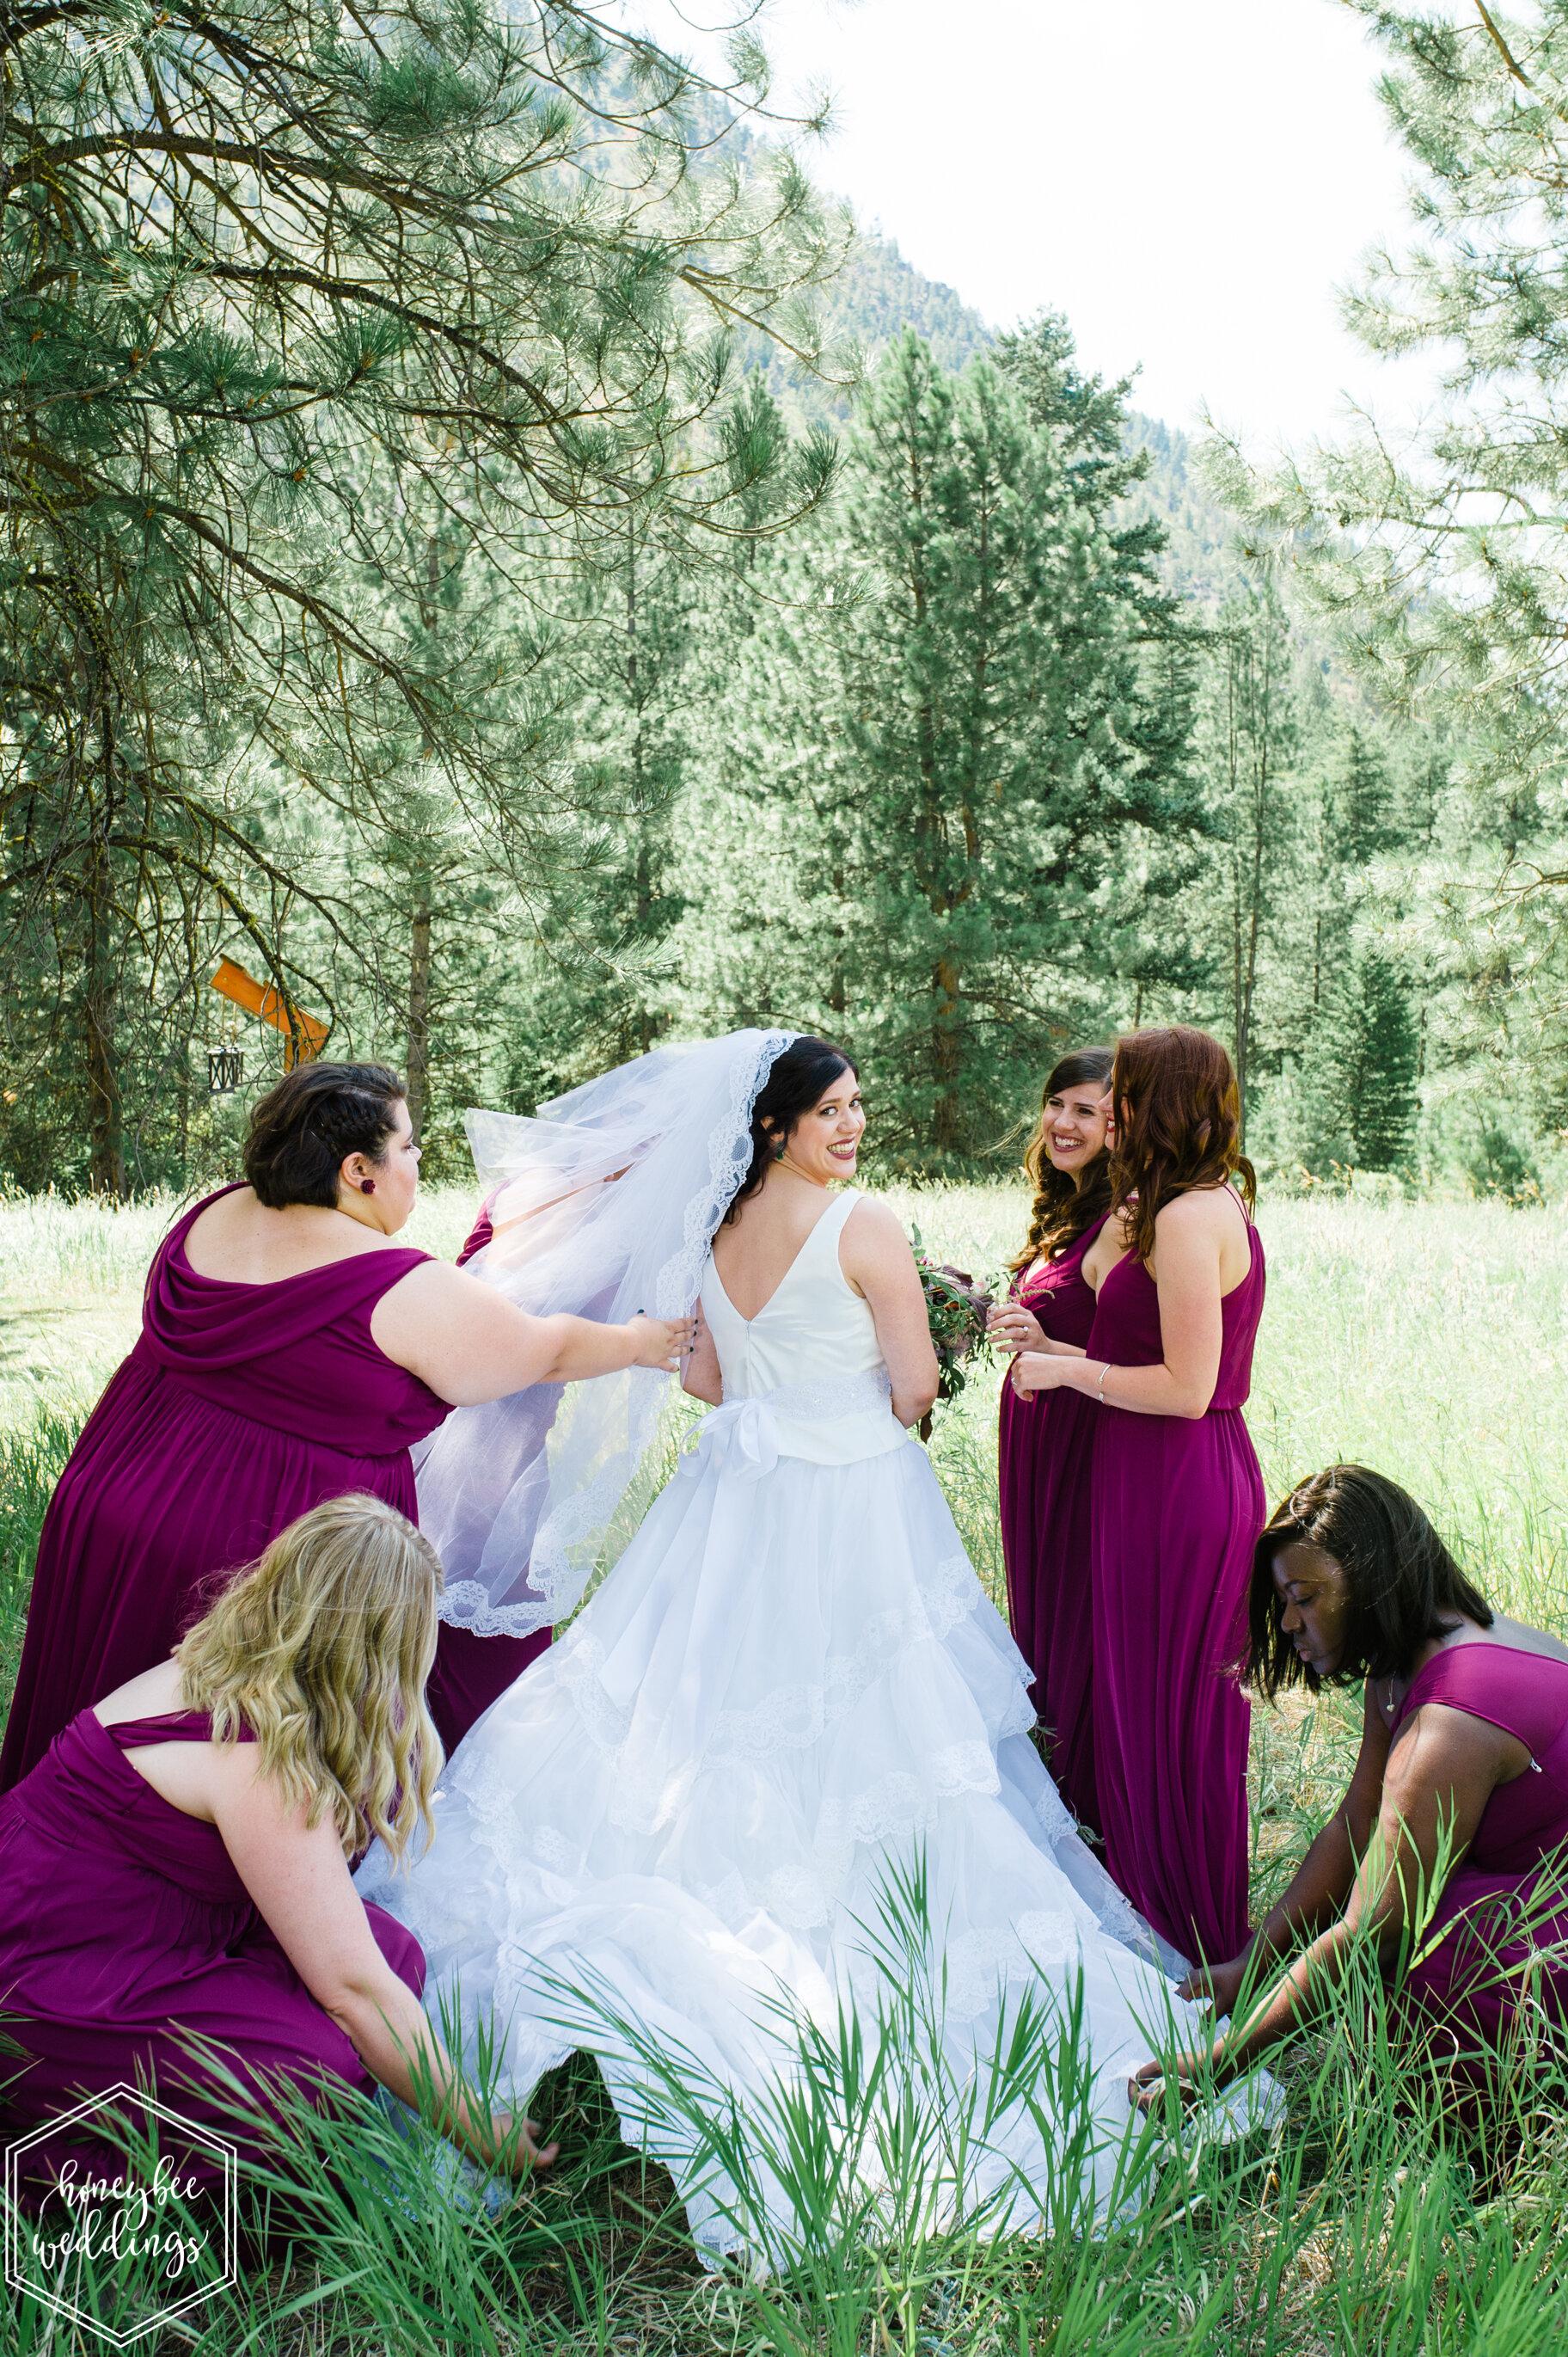 023White Raven Wedding_Montana Wedding Photographer_Rebekah & Likom_Honeybee Weddings_July 27, 2019-2595.jpg